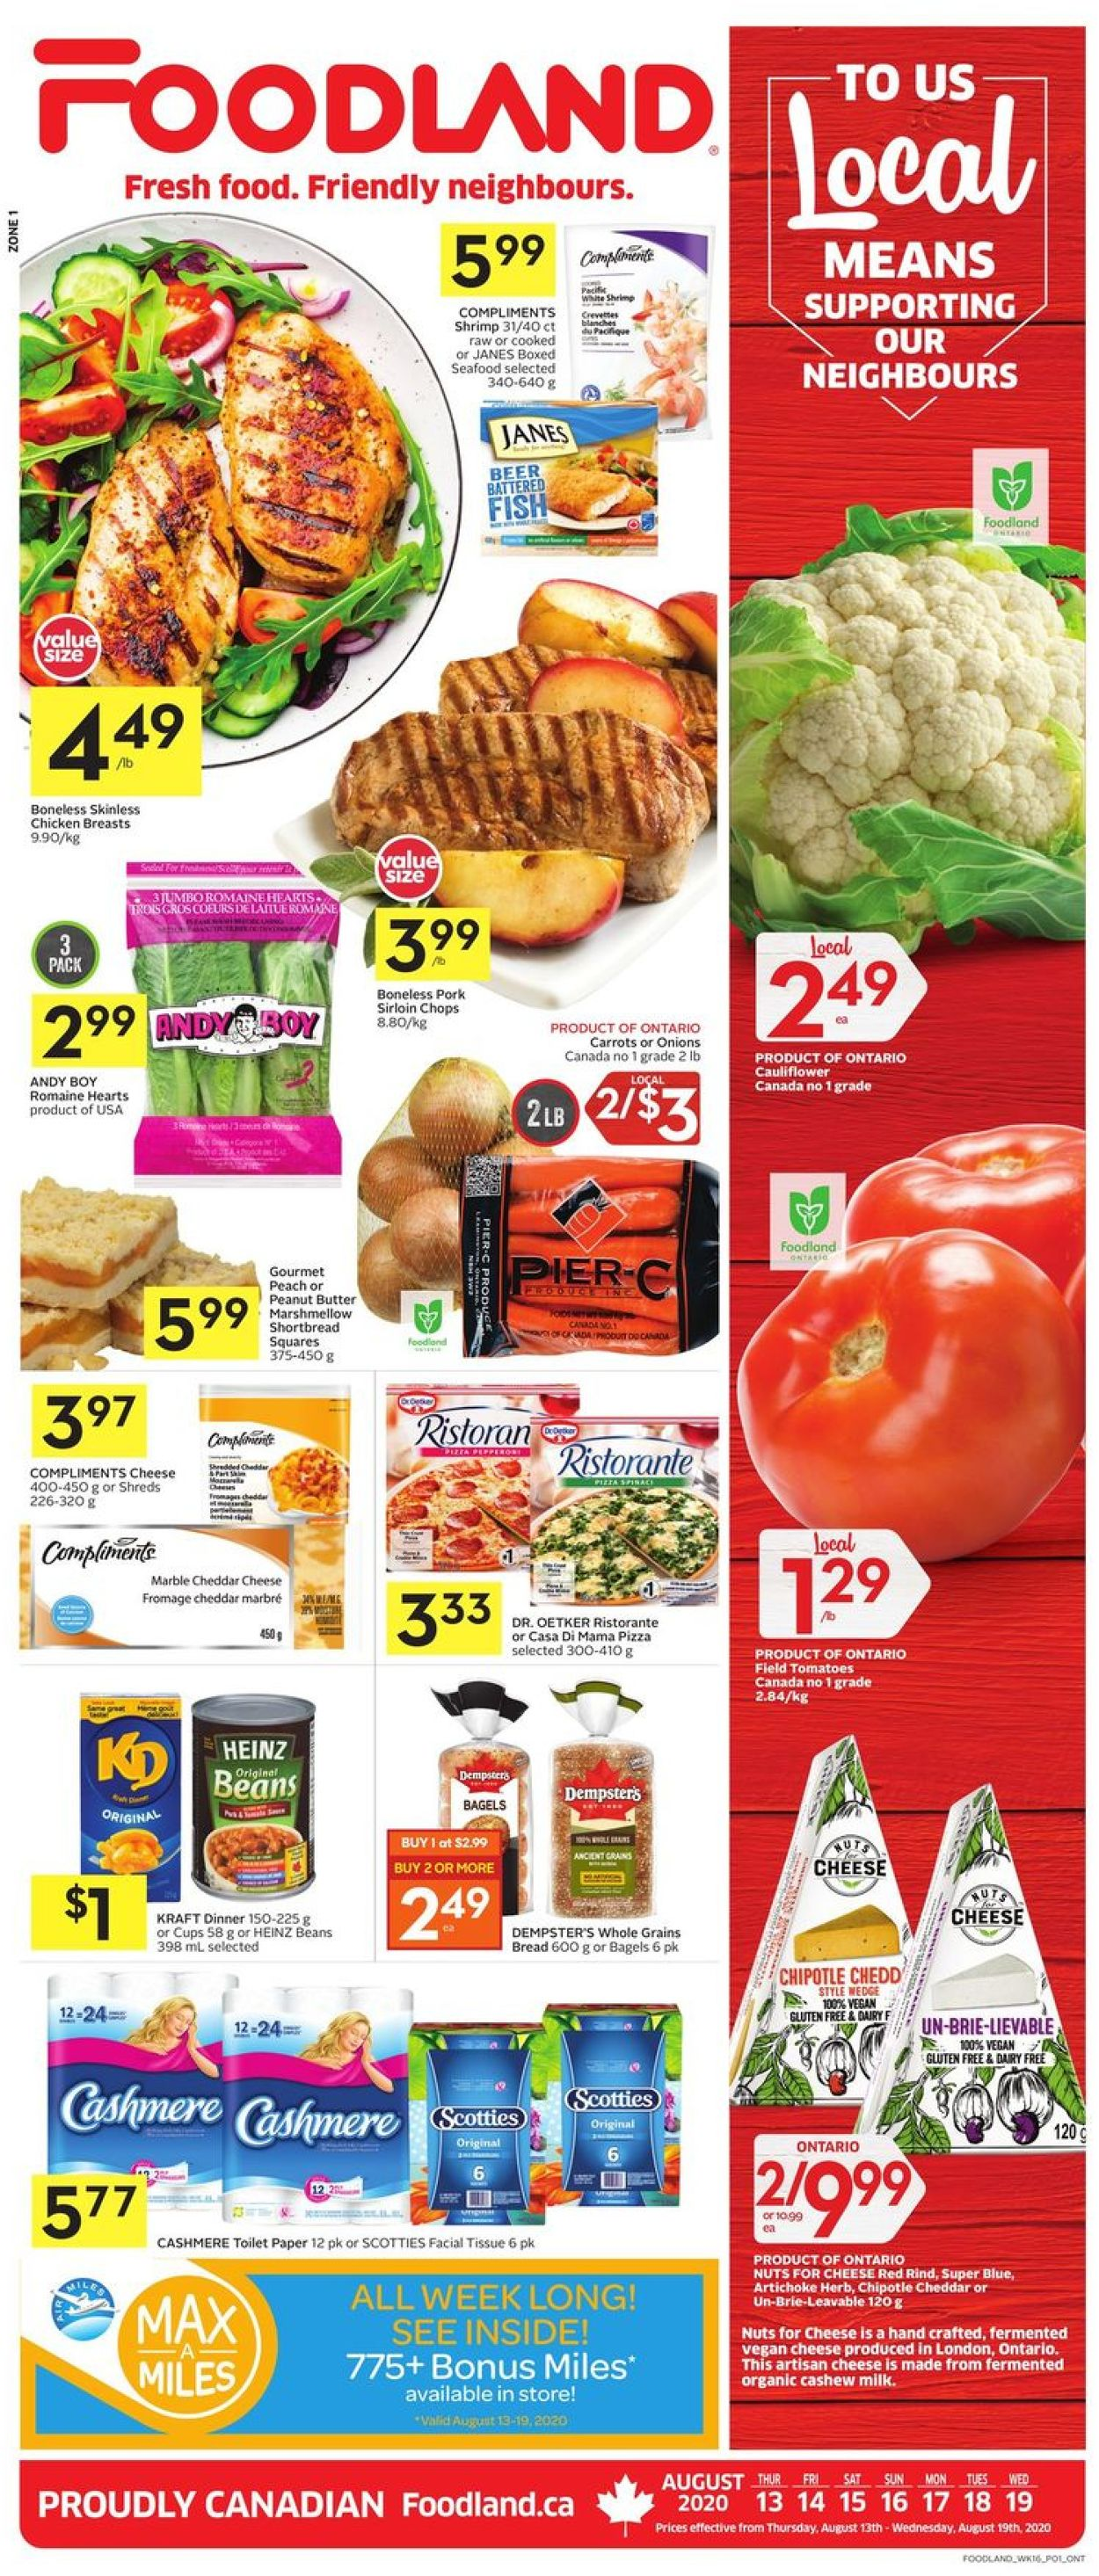 Foodland Flyer - 08/13-08/19/2020